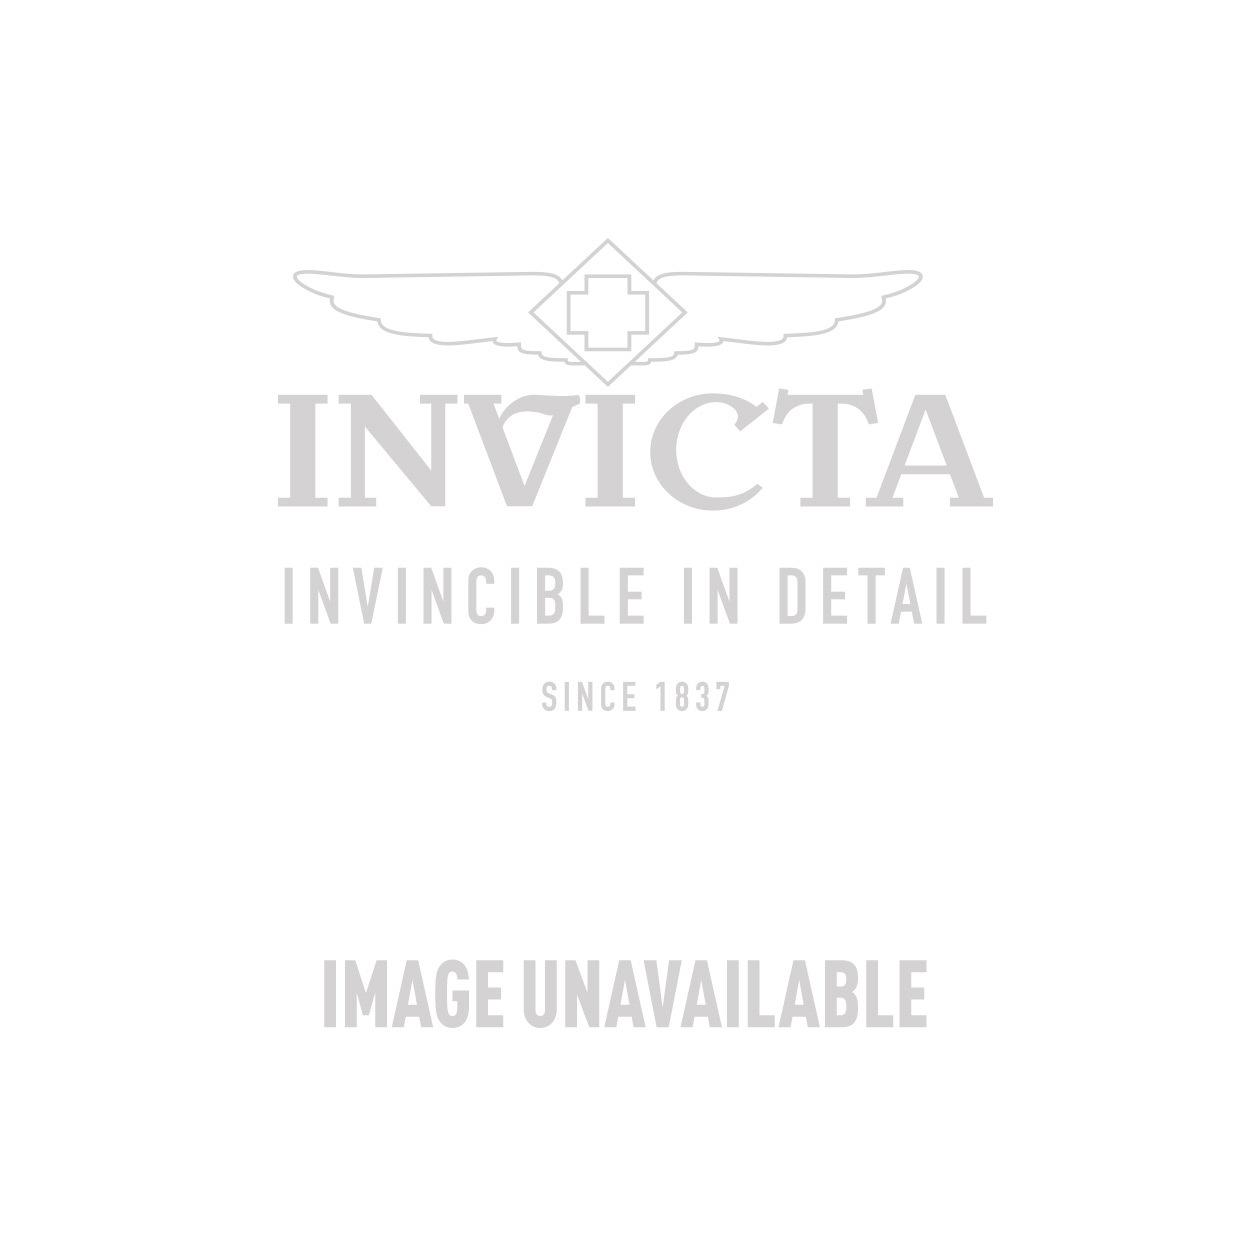 Invicta Ceramics Quartz Watch - Rose Gold, Black case with Black tone Leather band - Model 11252